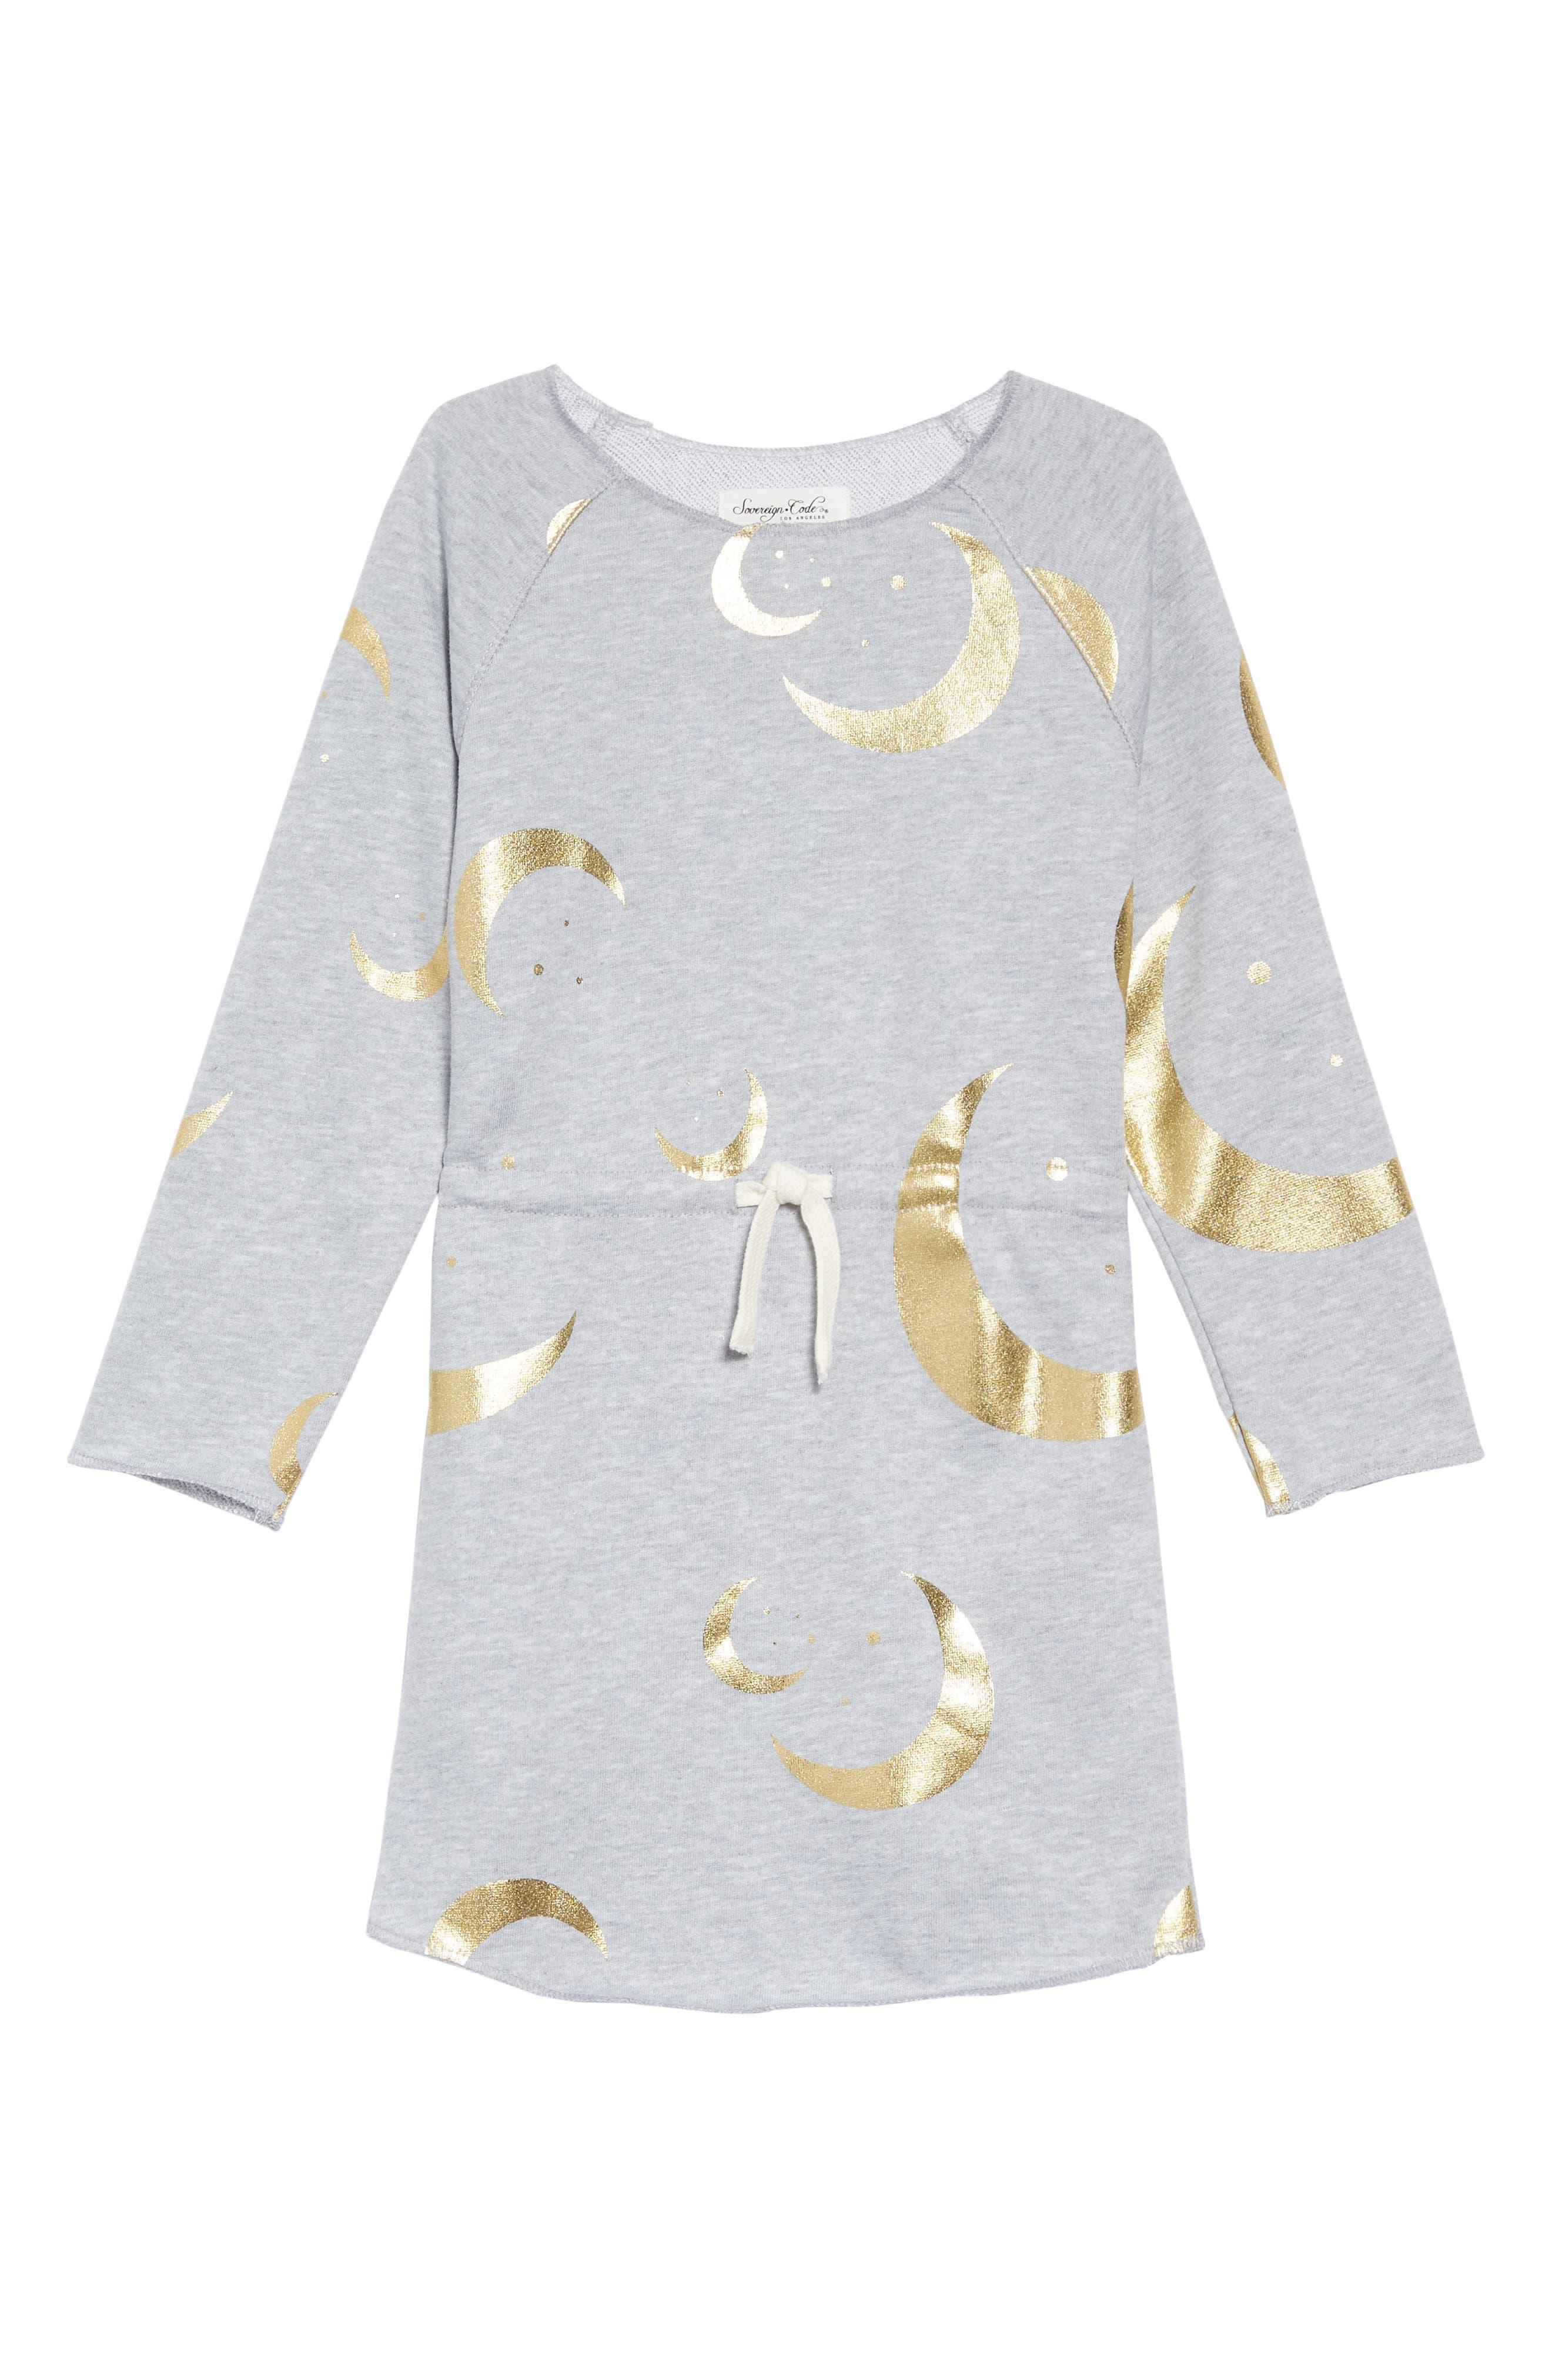 Danica Print Sweatshirt Dress, Main, color, HALF MOON/HEATHER GREY